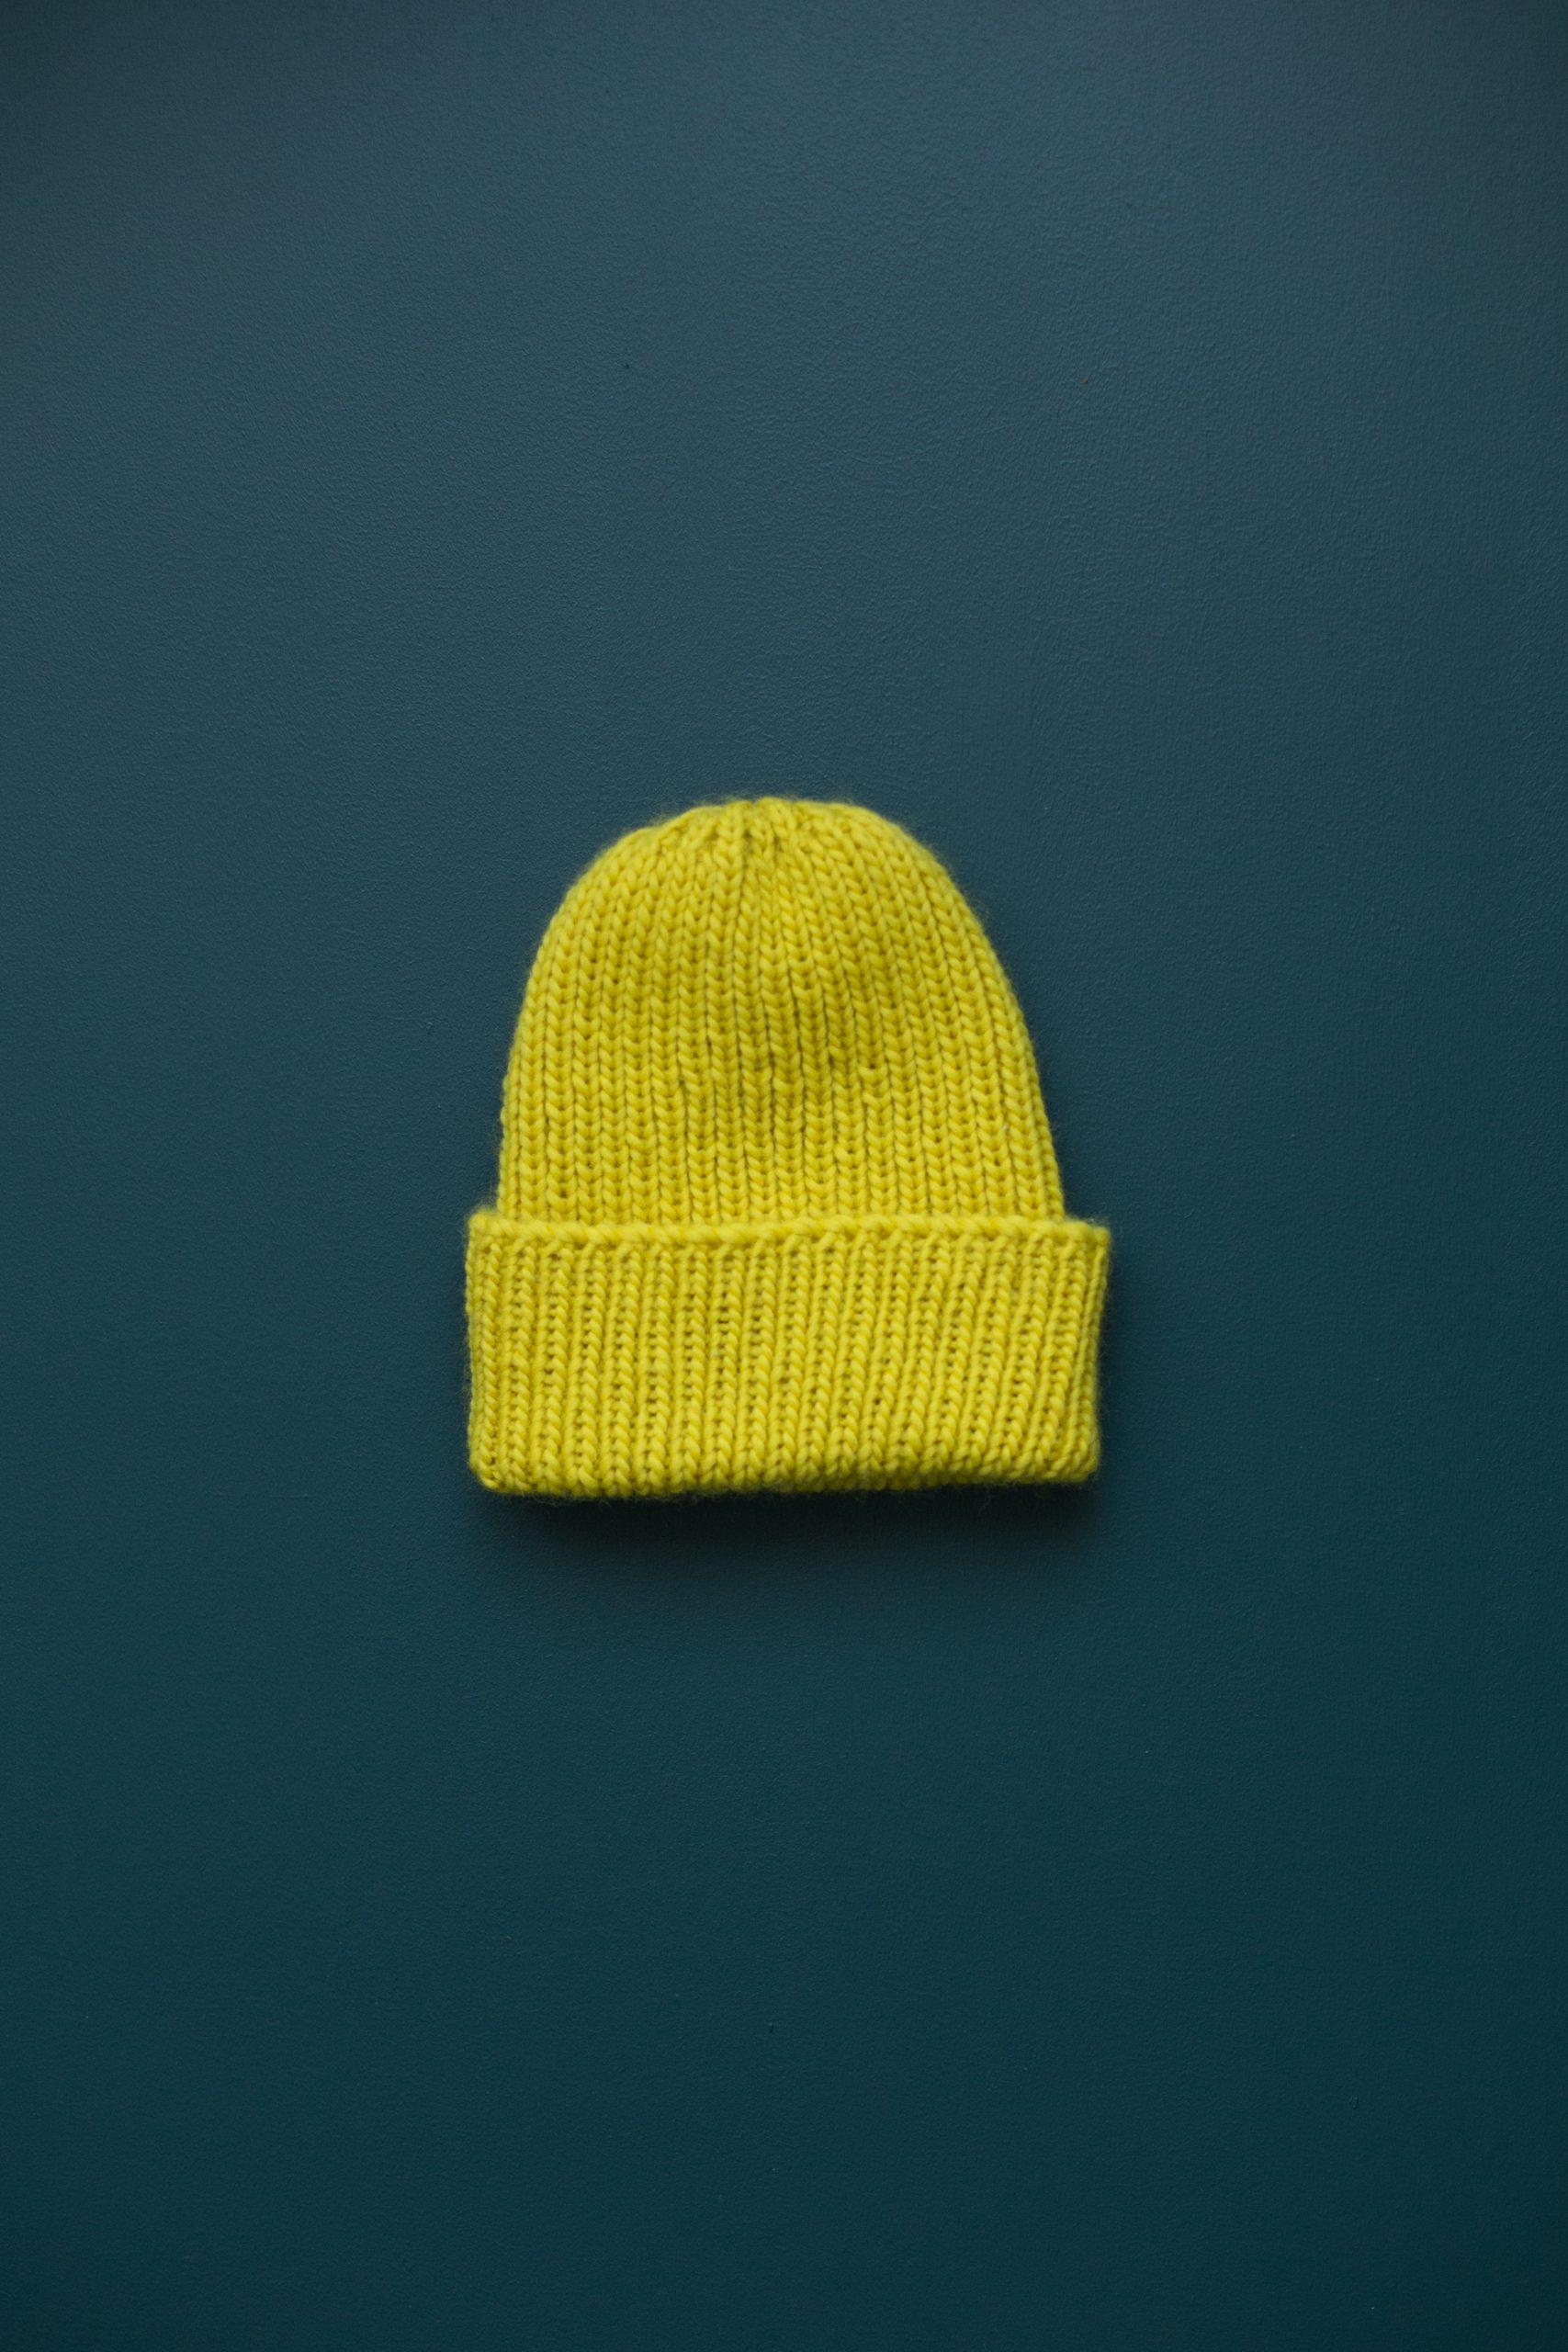 knitting pattern knitting kit beanie